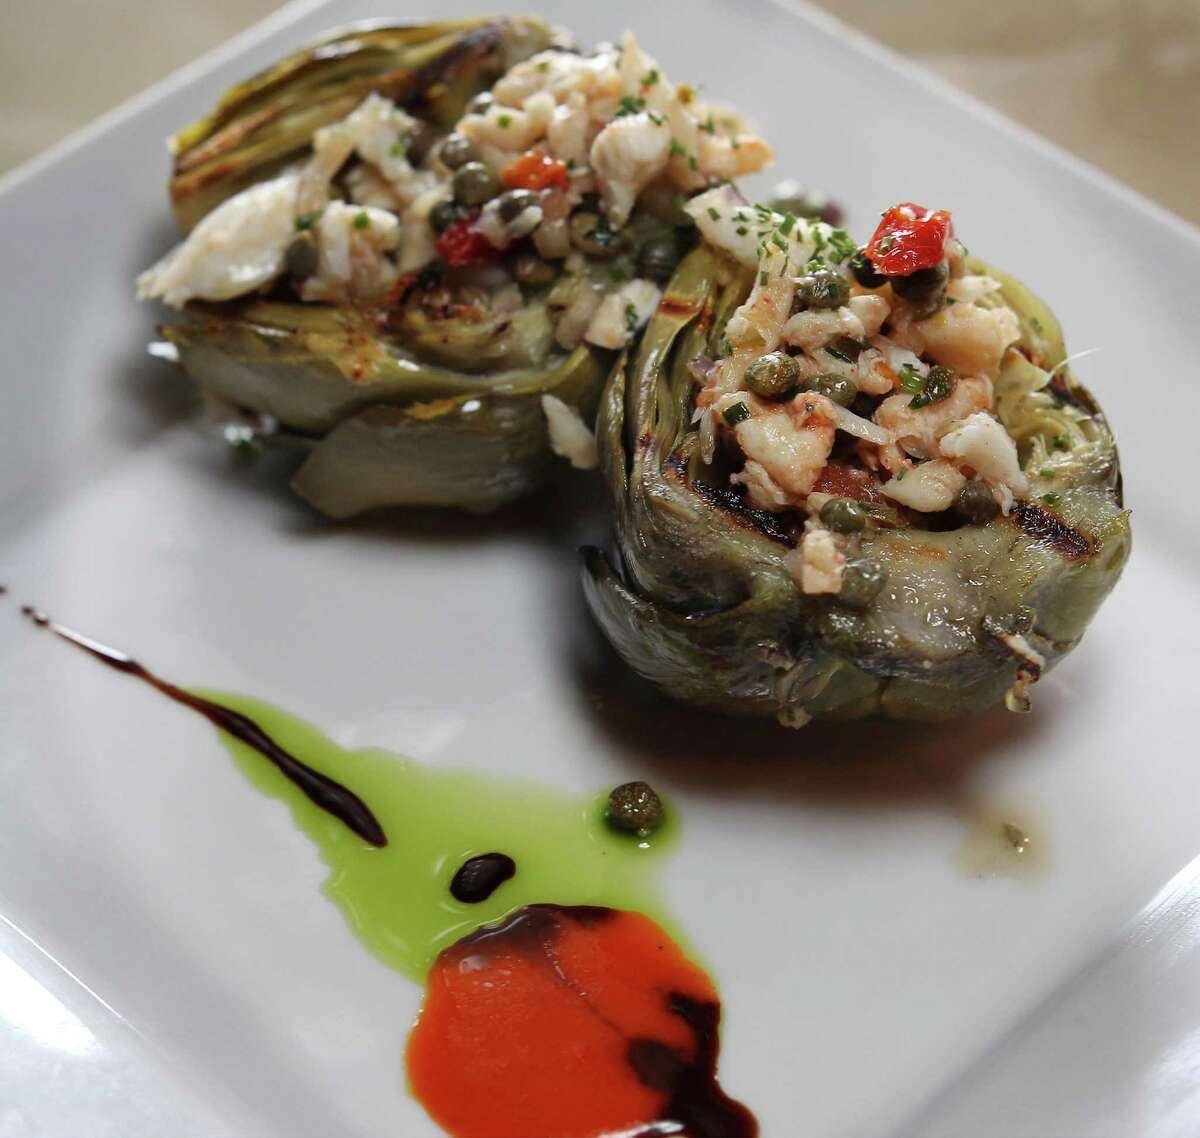 Grilled artichoke with crab vinaigrette by Chef Damien Watel at Chez Vatel Bistro.